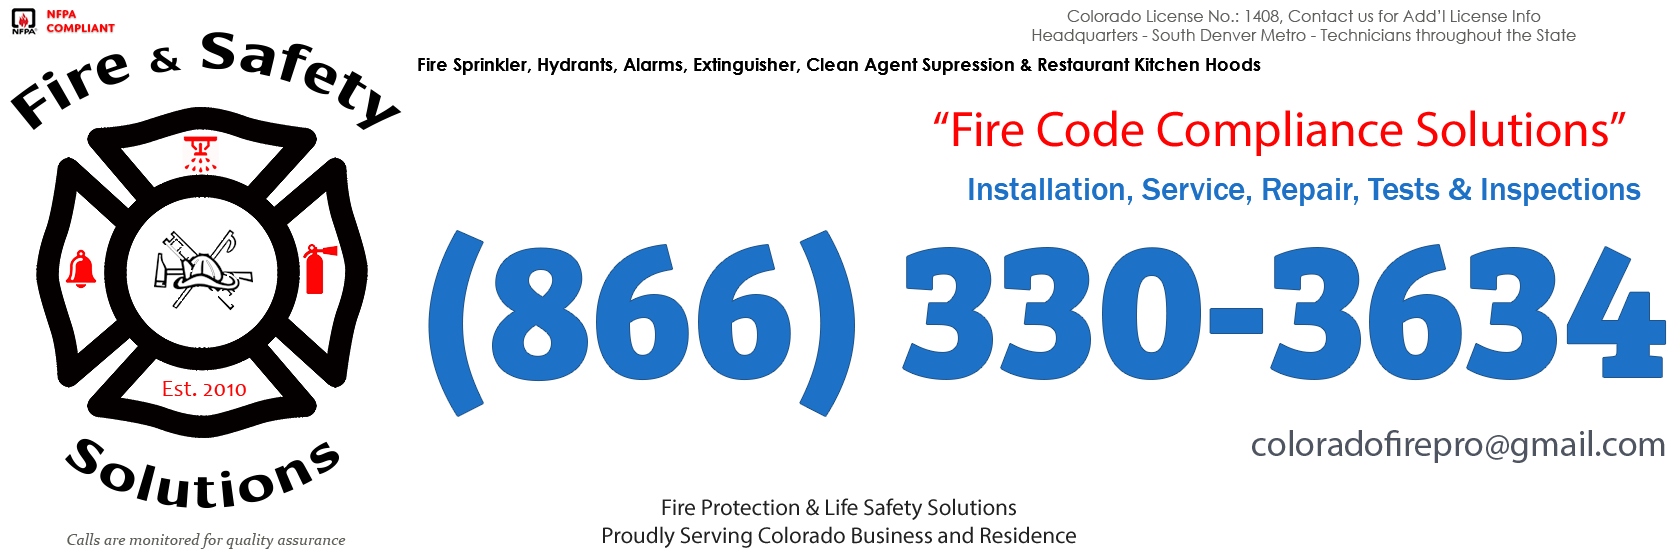 Colorado Springs, Colorado Fire Sprinkler Service Company